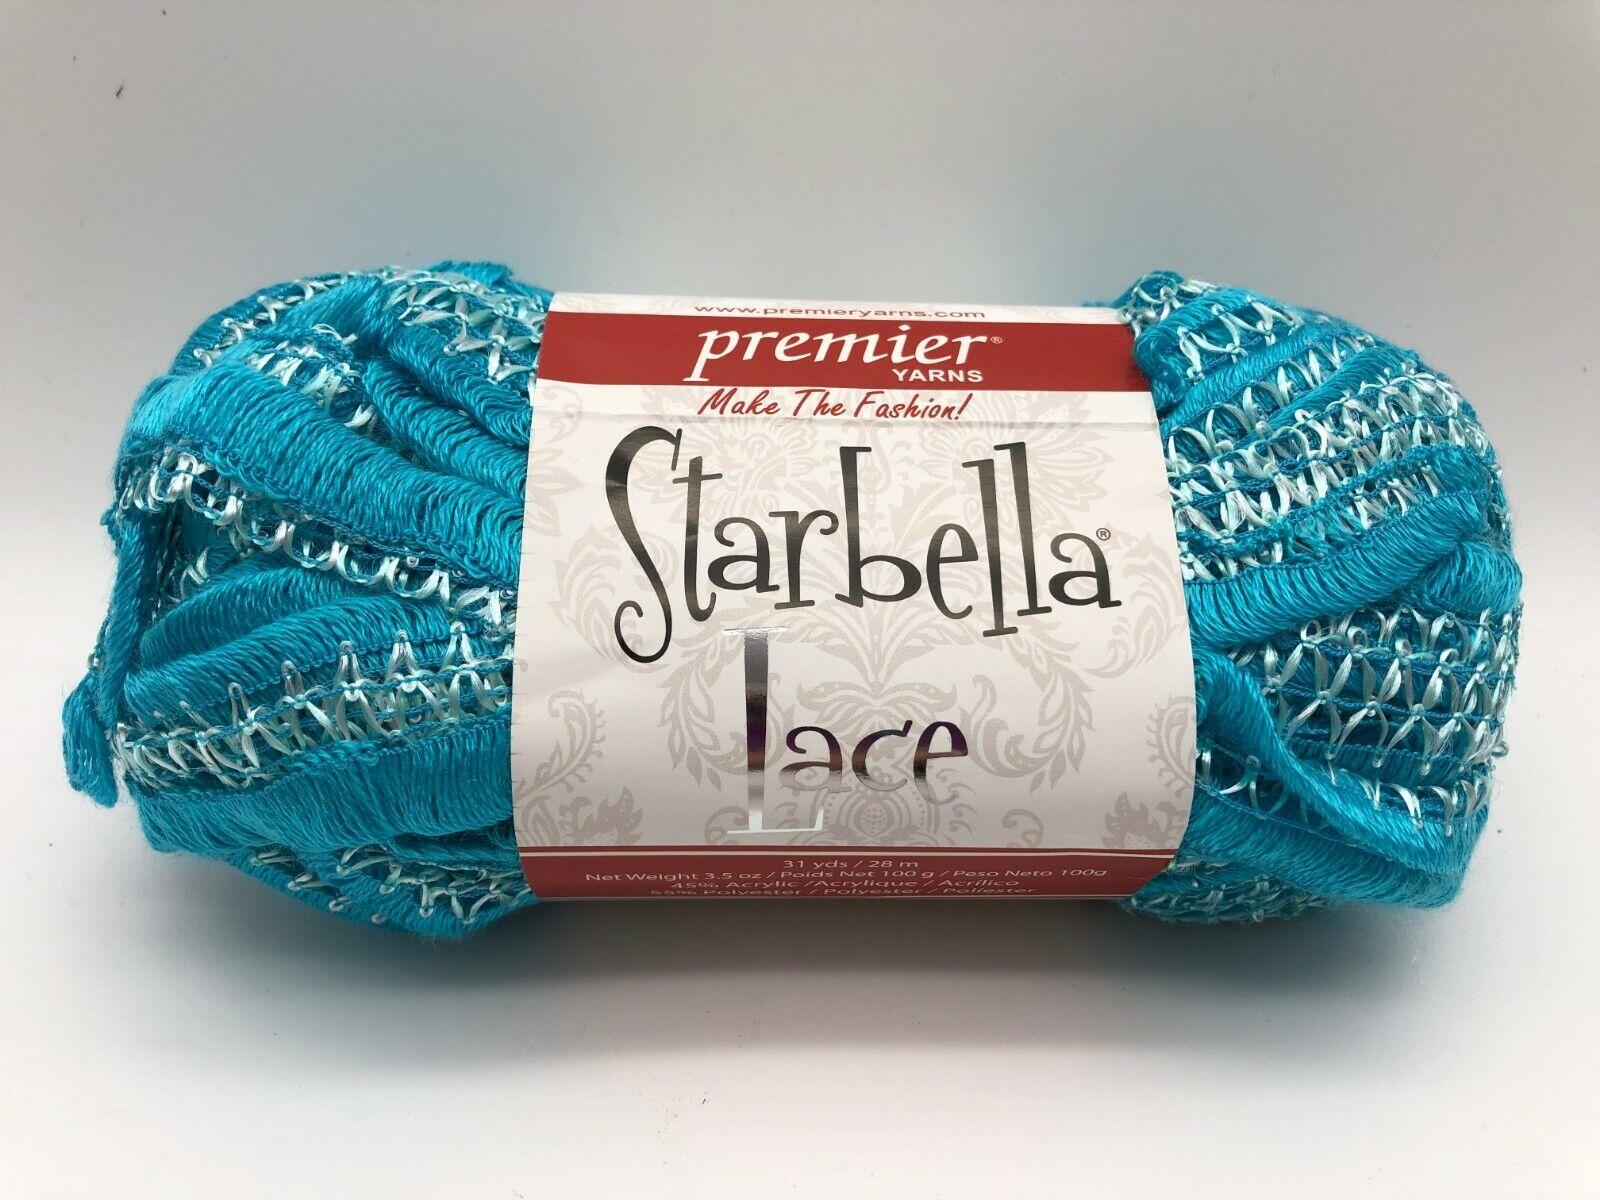 Premier Yarns Starbella Stripes Ruffle Yarn 99 Total Yards 3 Bundles in PKGE